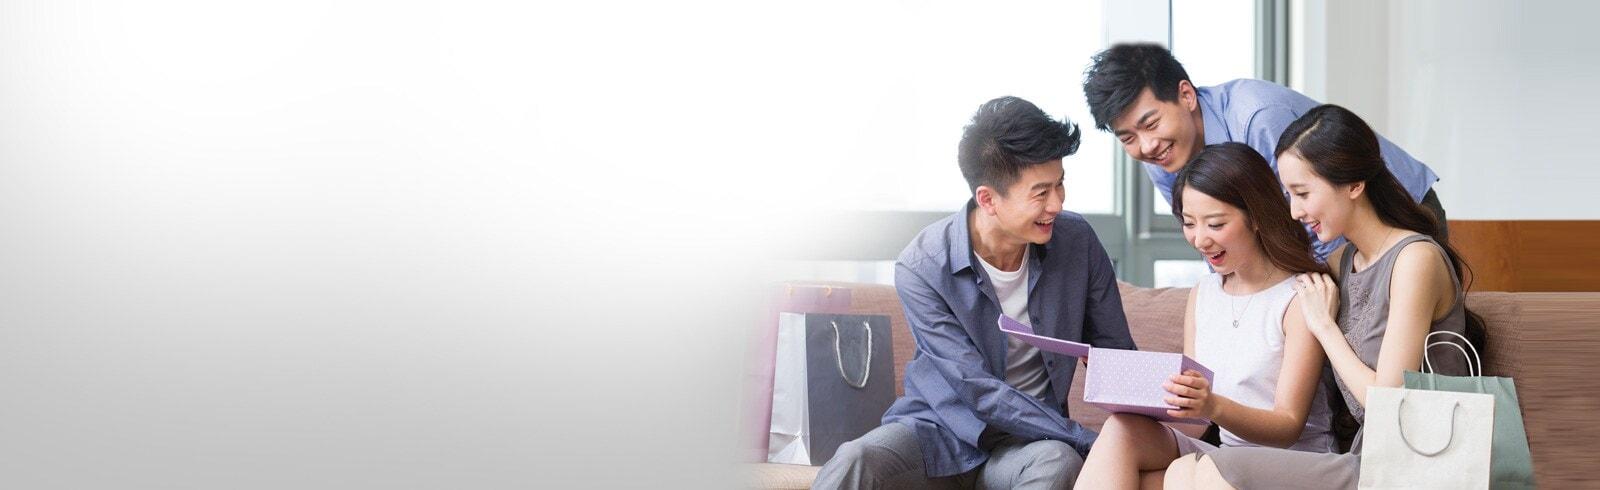 Person, Human, Sitting